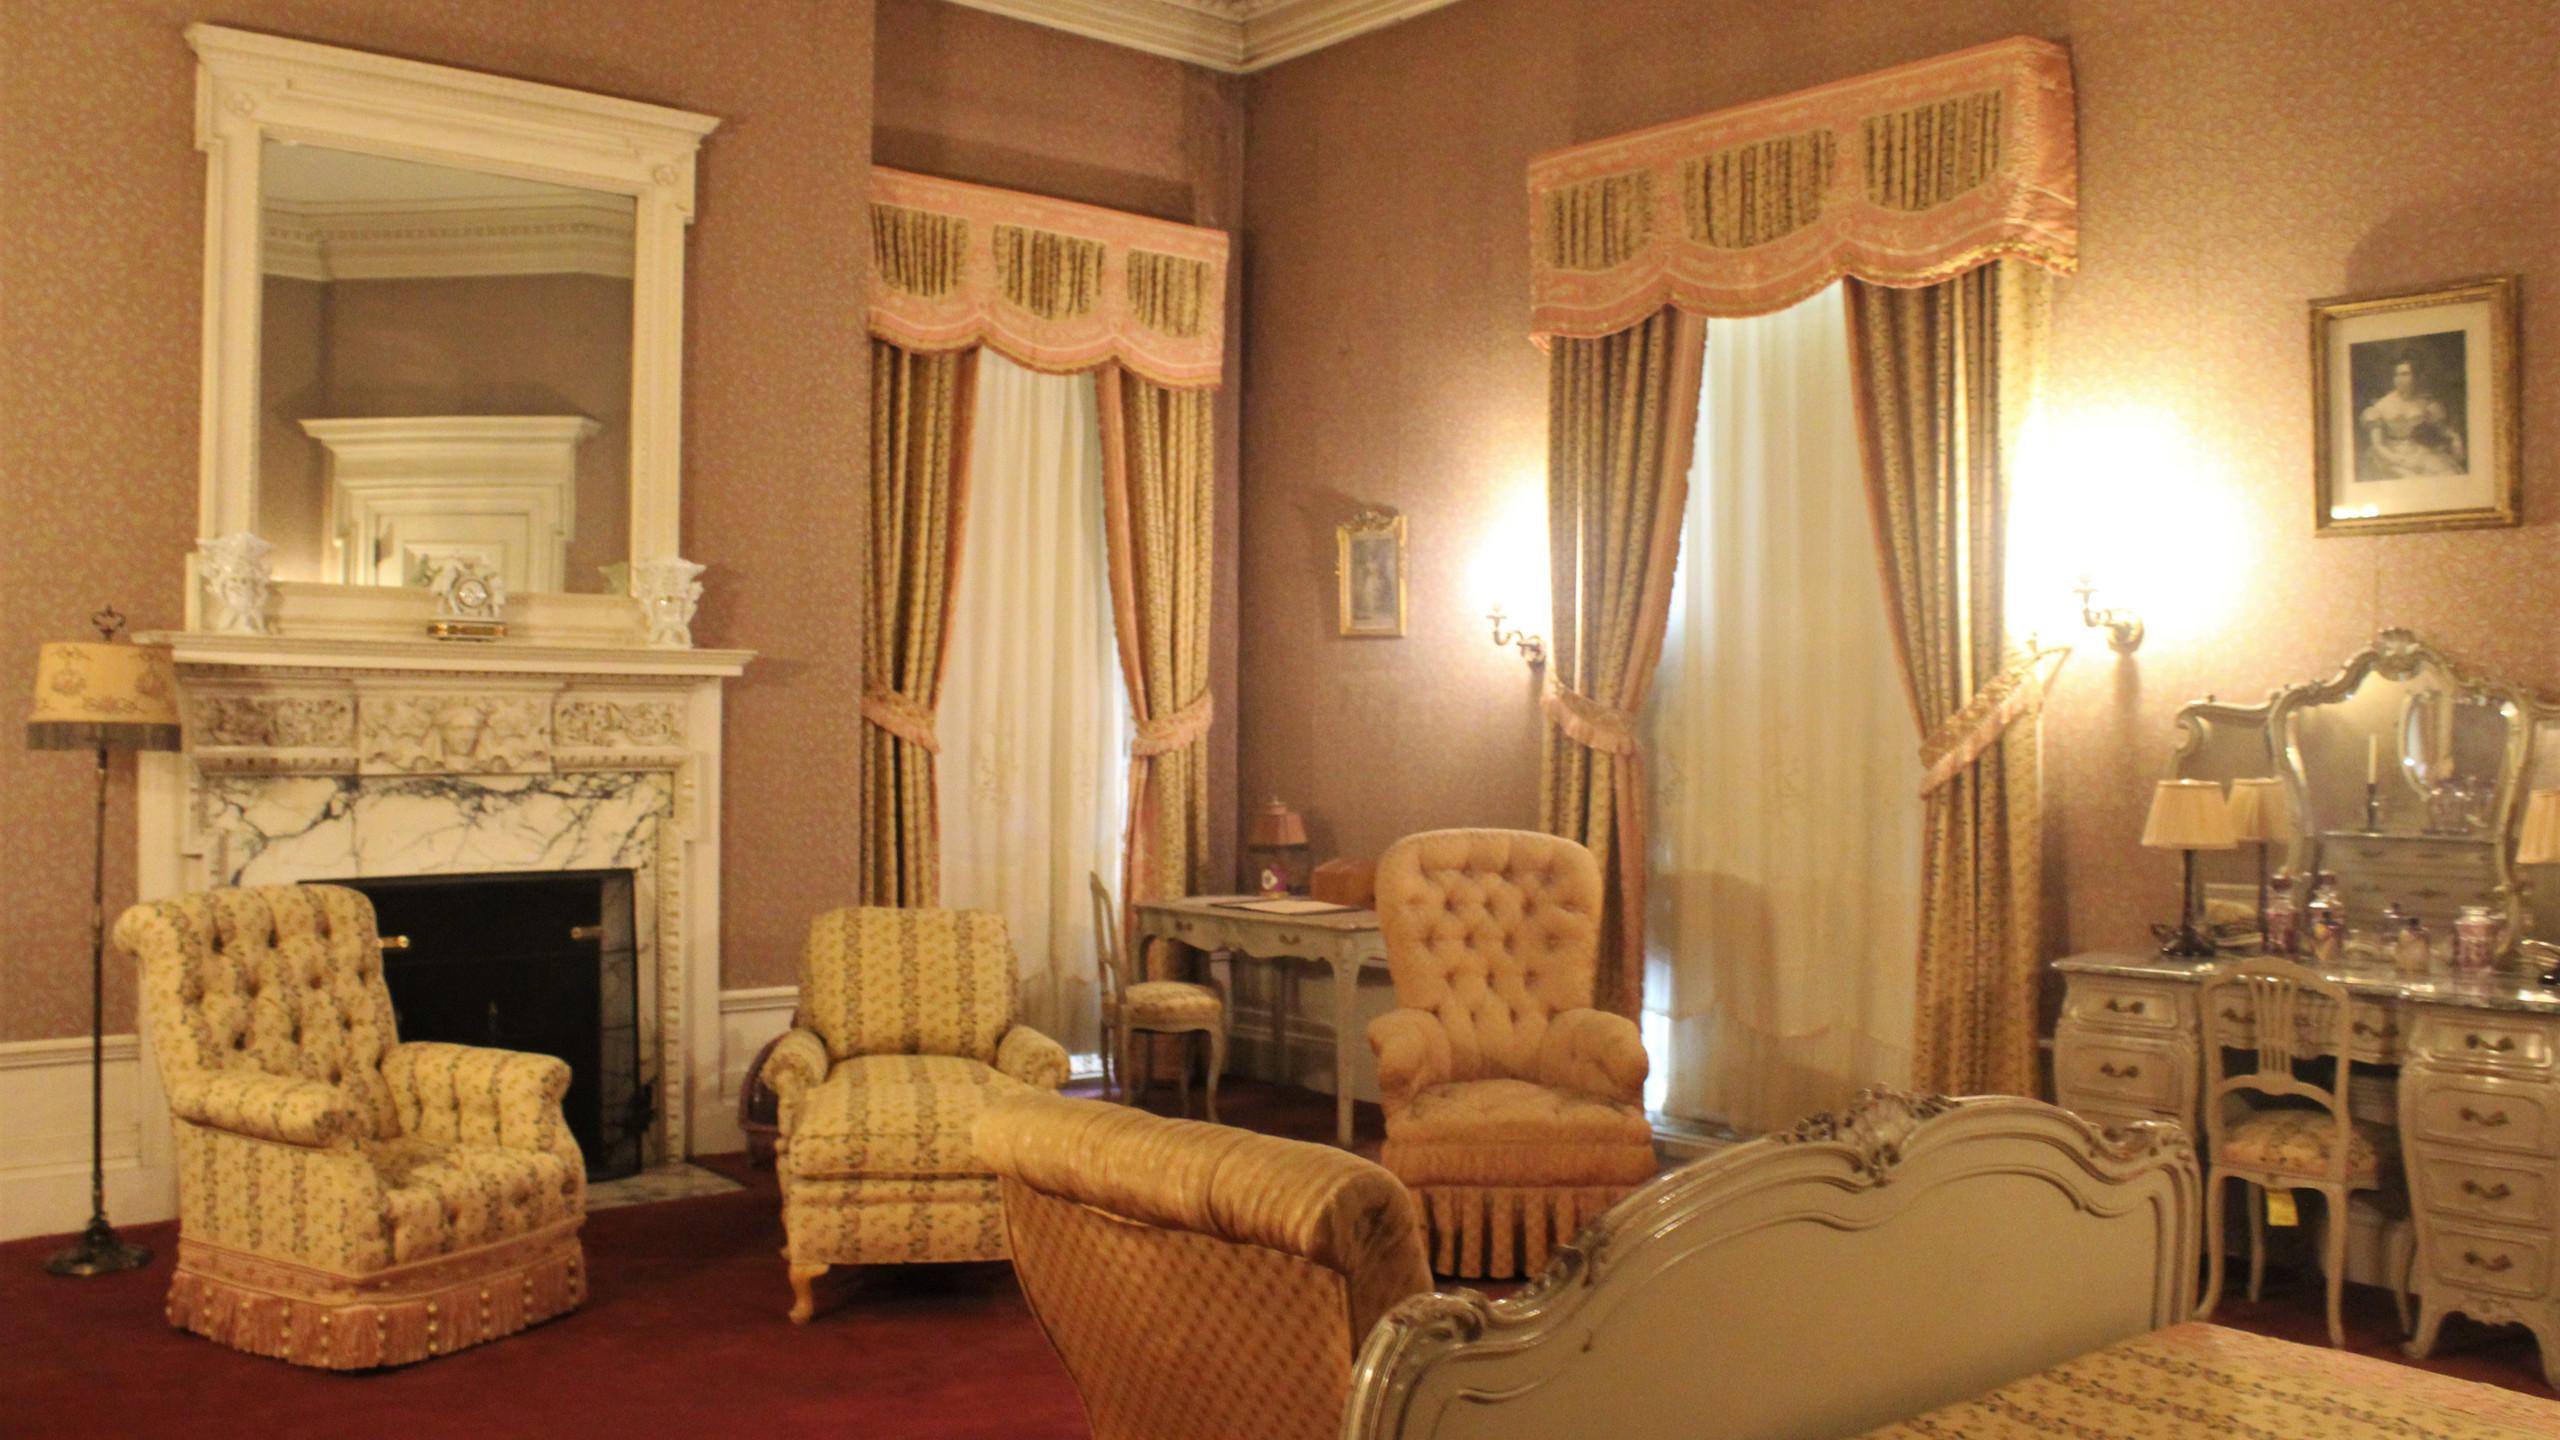 The Mauve Room